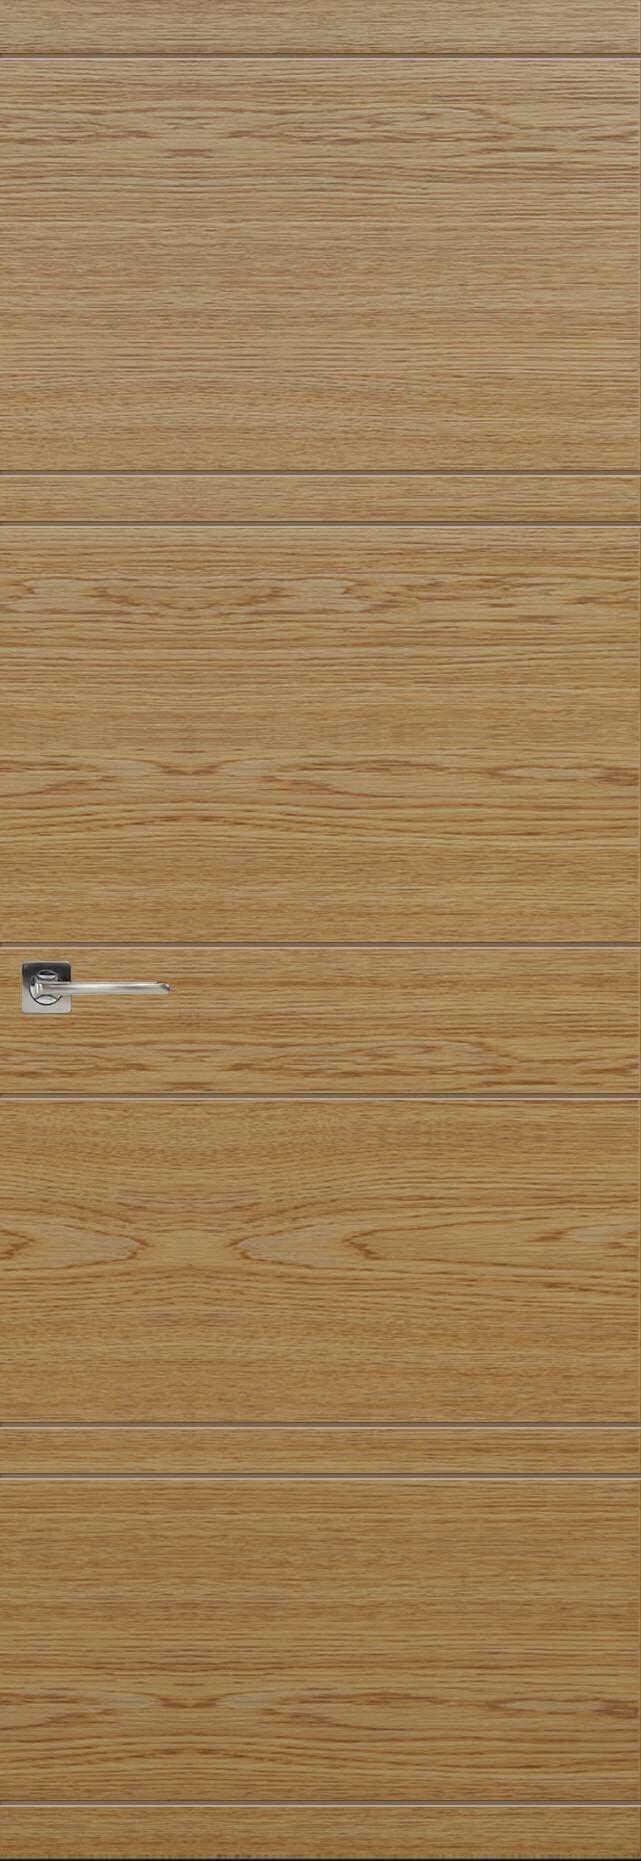 Tivoli Е-2 Невидимка цвет - Дуб карамель Без стекла (ДГ)